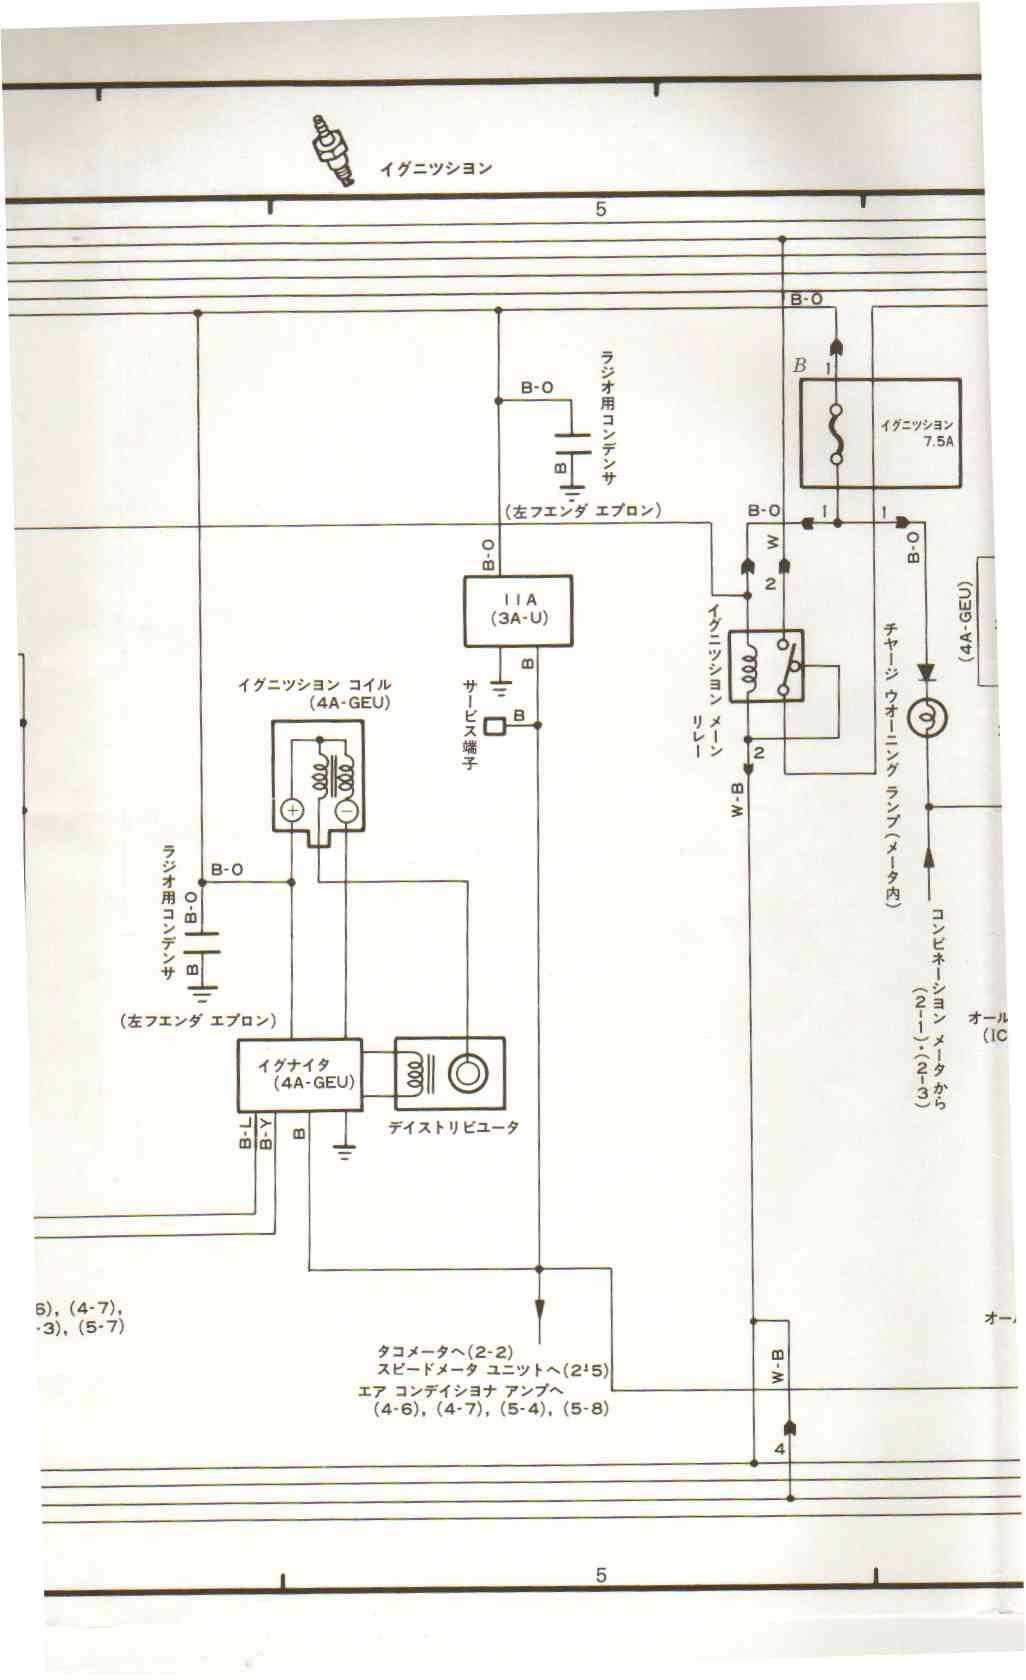 club4ag 4a ge 16v japan ae86 ecu pin identification club4ag. Black Bedroom Furniture Sets. Home Design Ideas